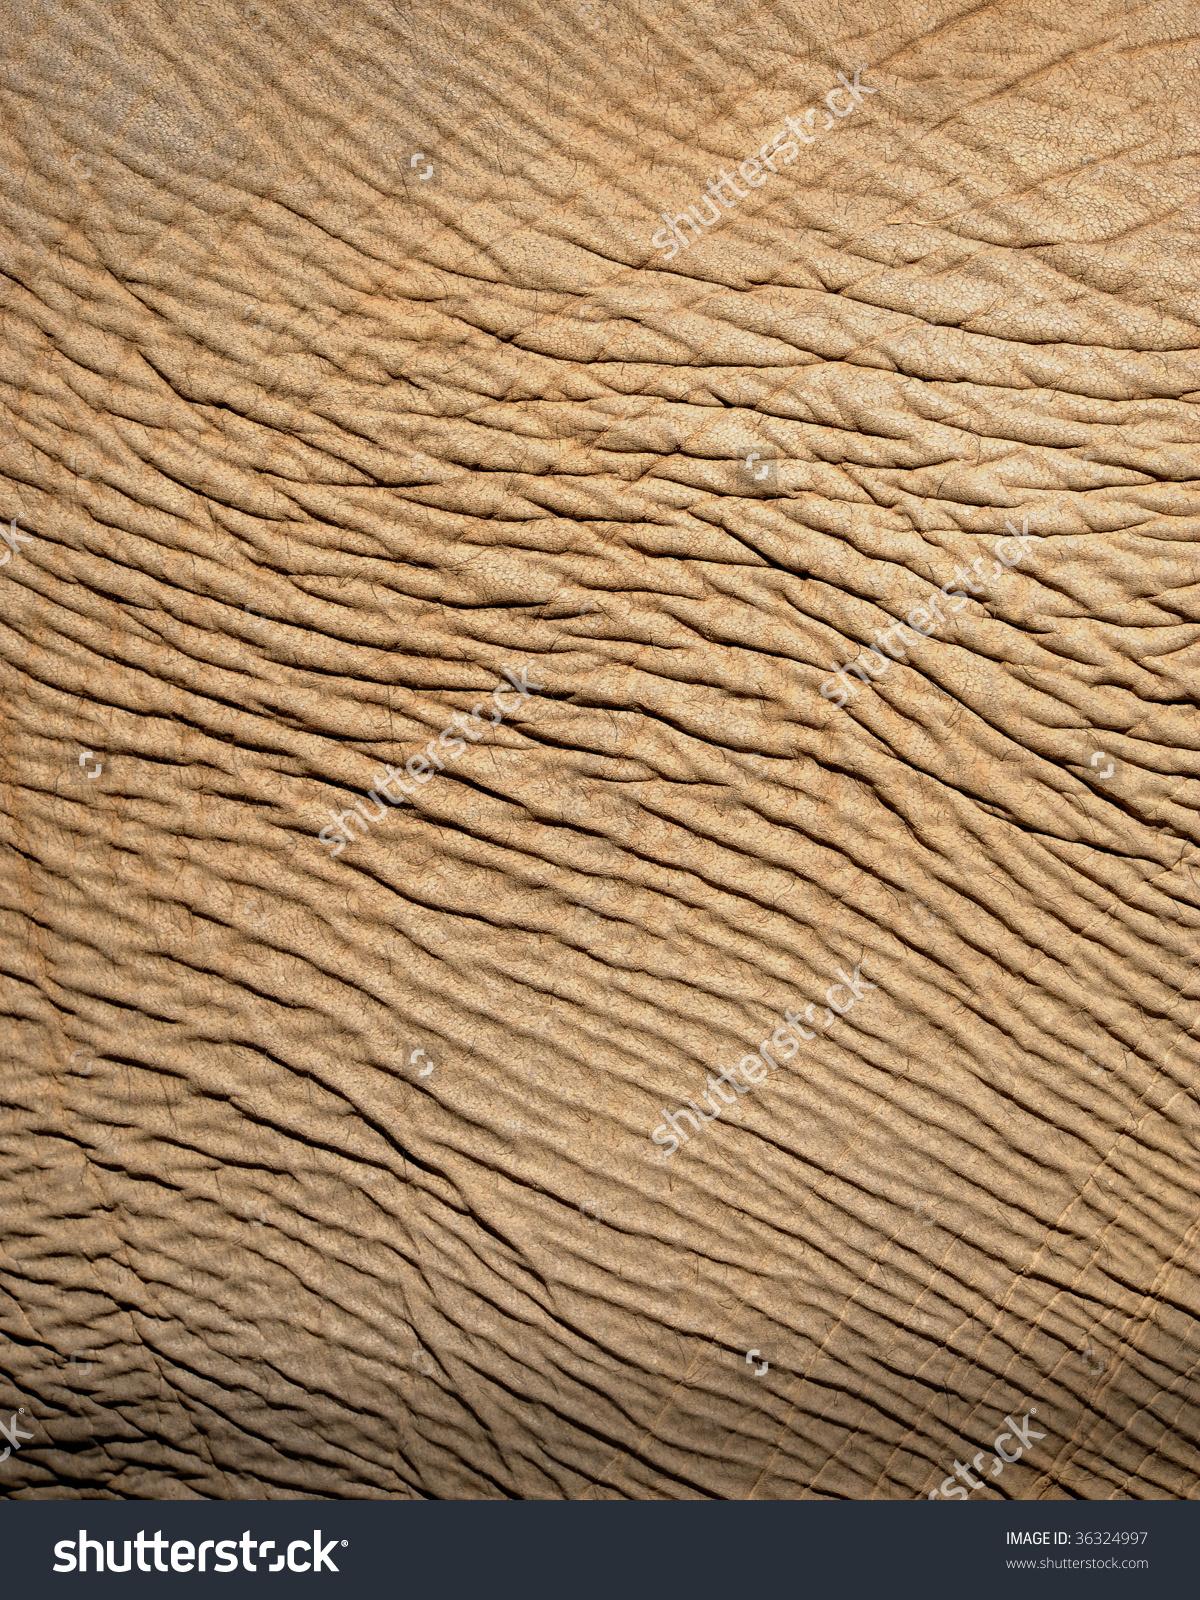 Close Asian Elephant Skin Showing Wrinkles Stock Photo 36324997.